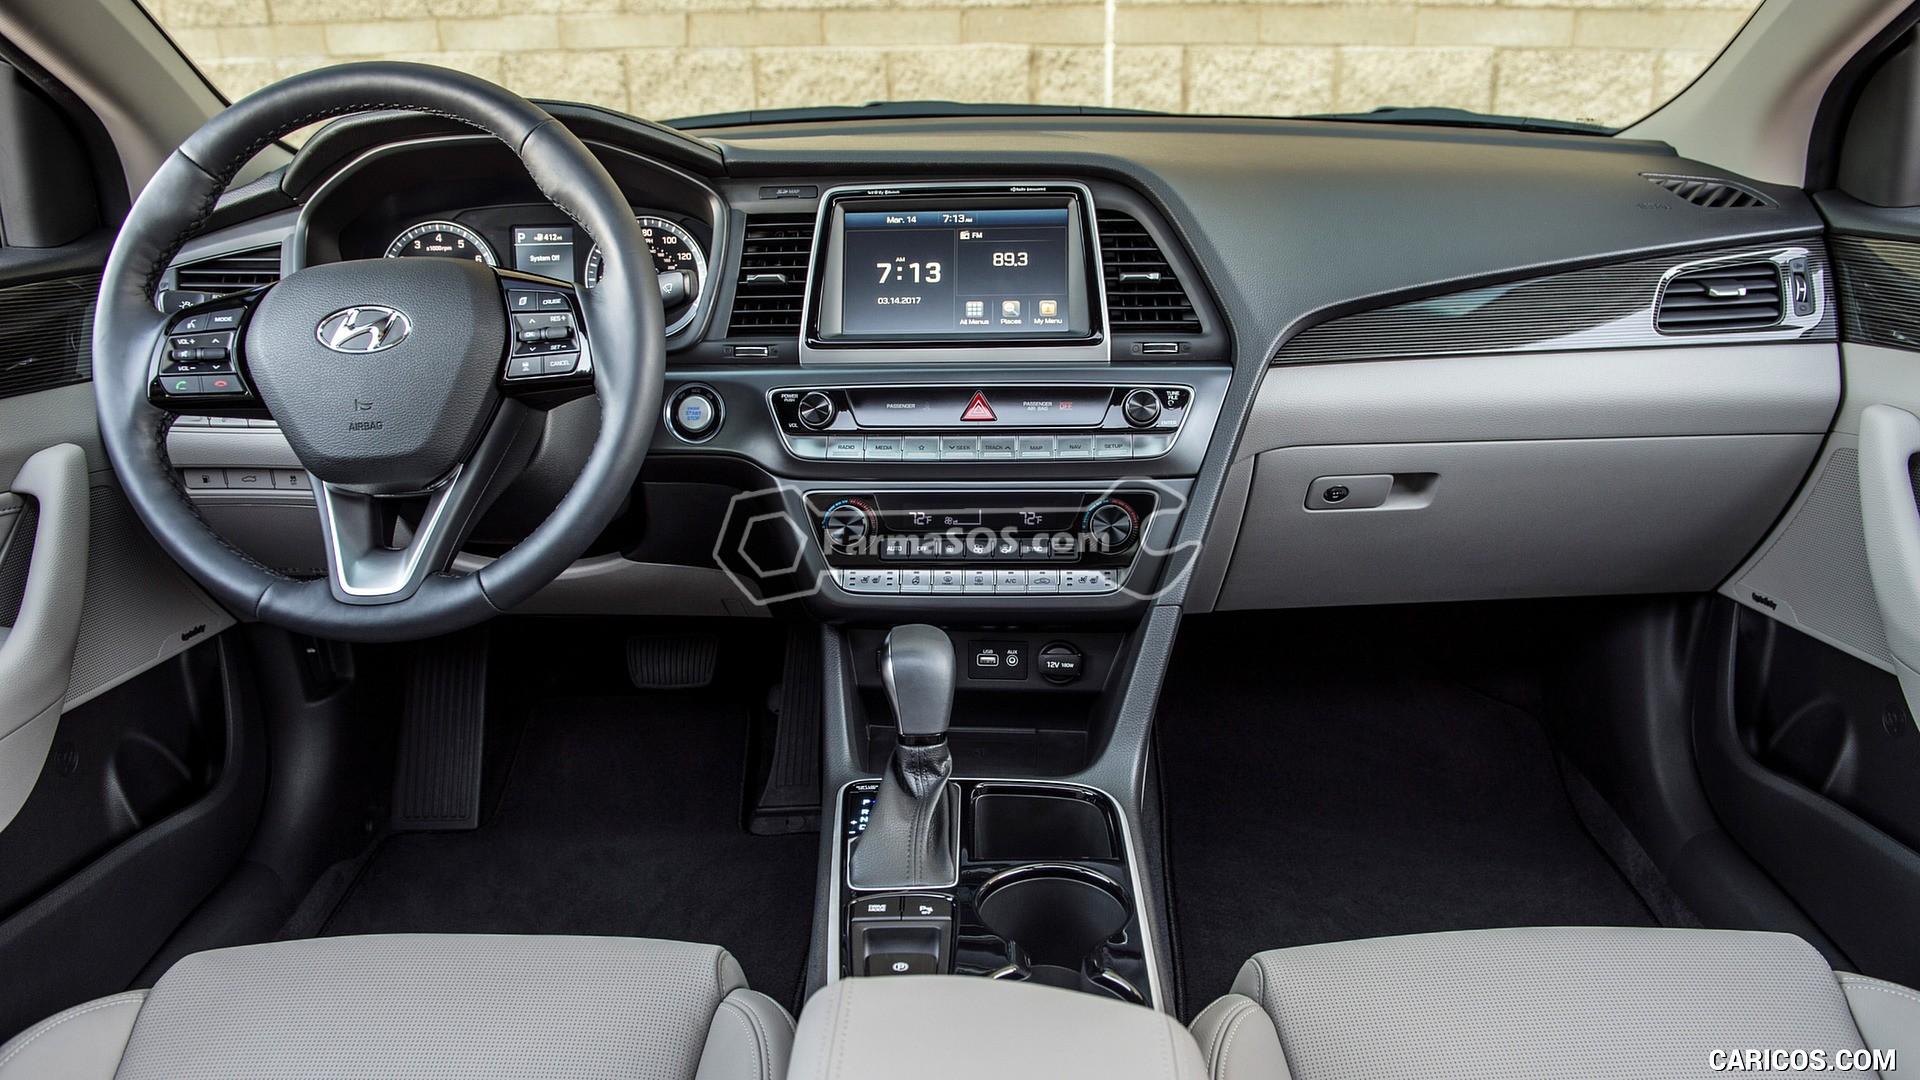 Hyundai Sonata 2018 2019 8 تصاویر هیوندای سوناتا مدل 2018 تا 2019